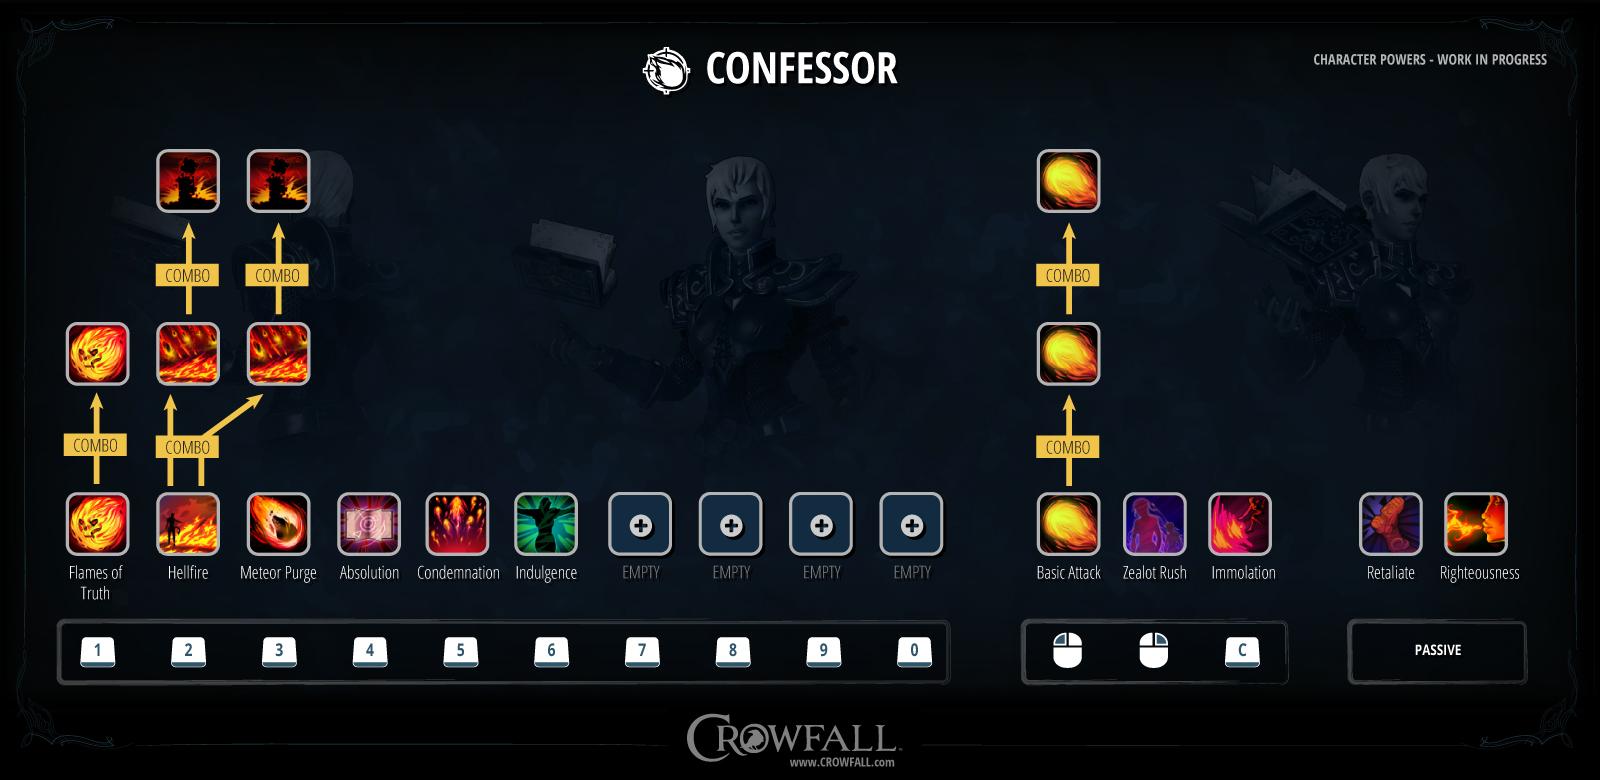 ConfessorAbilityTree_Release.jpg